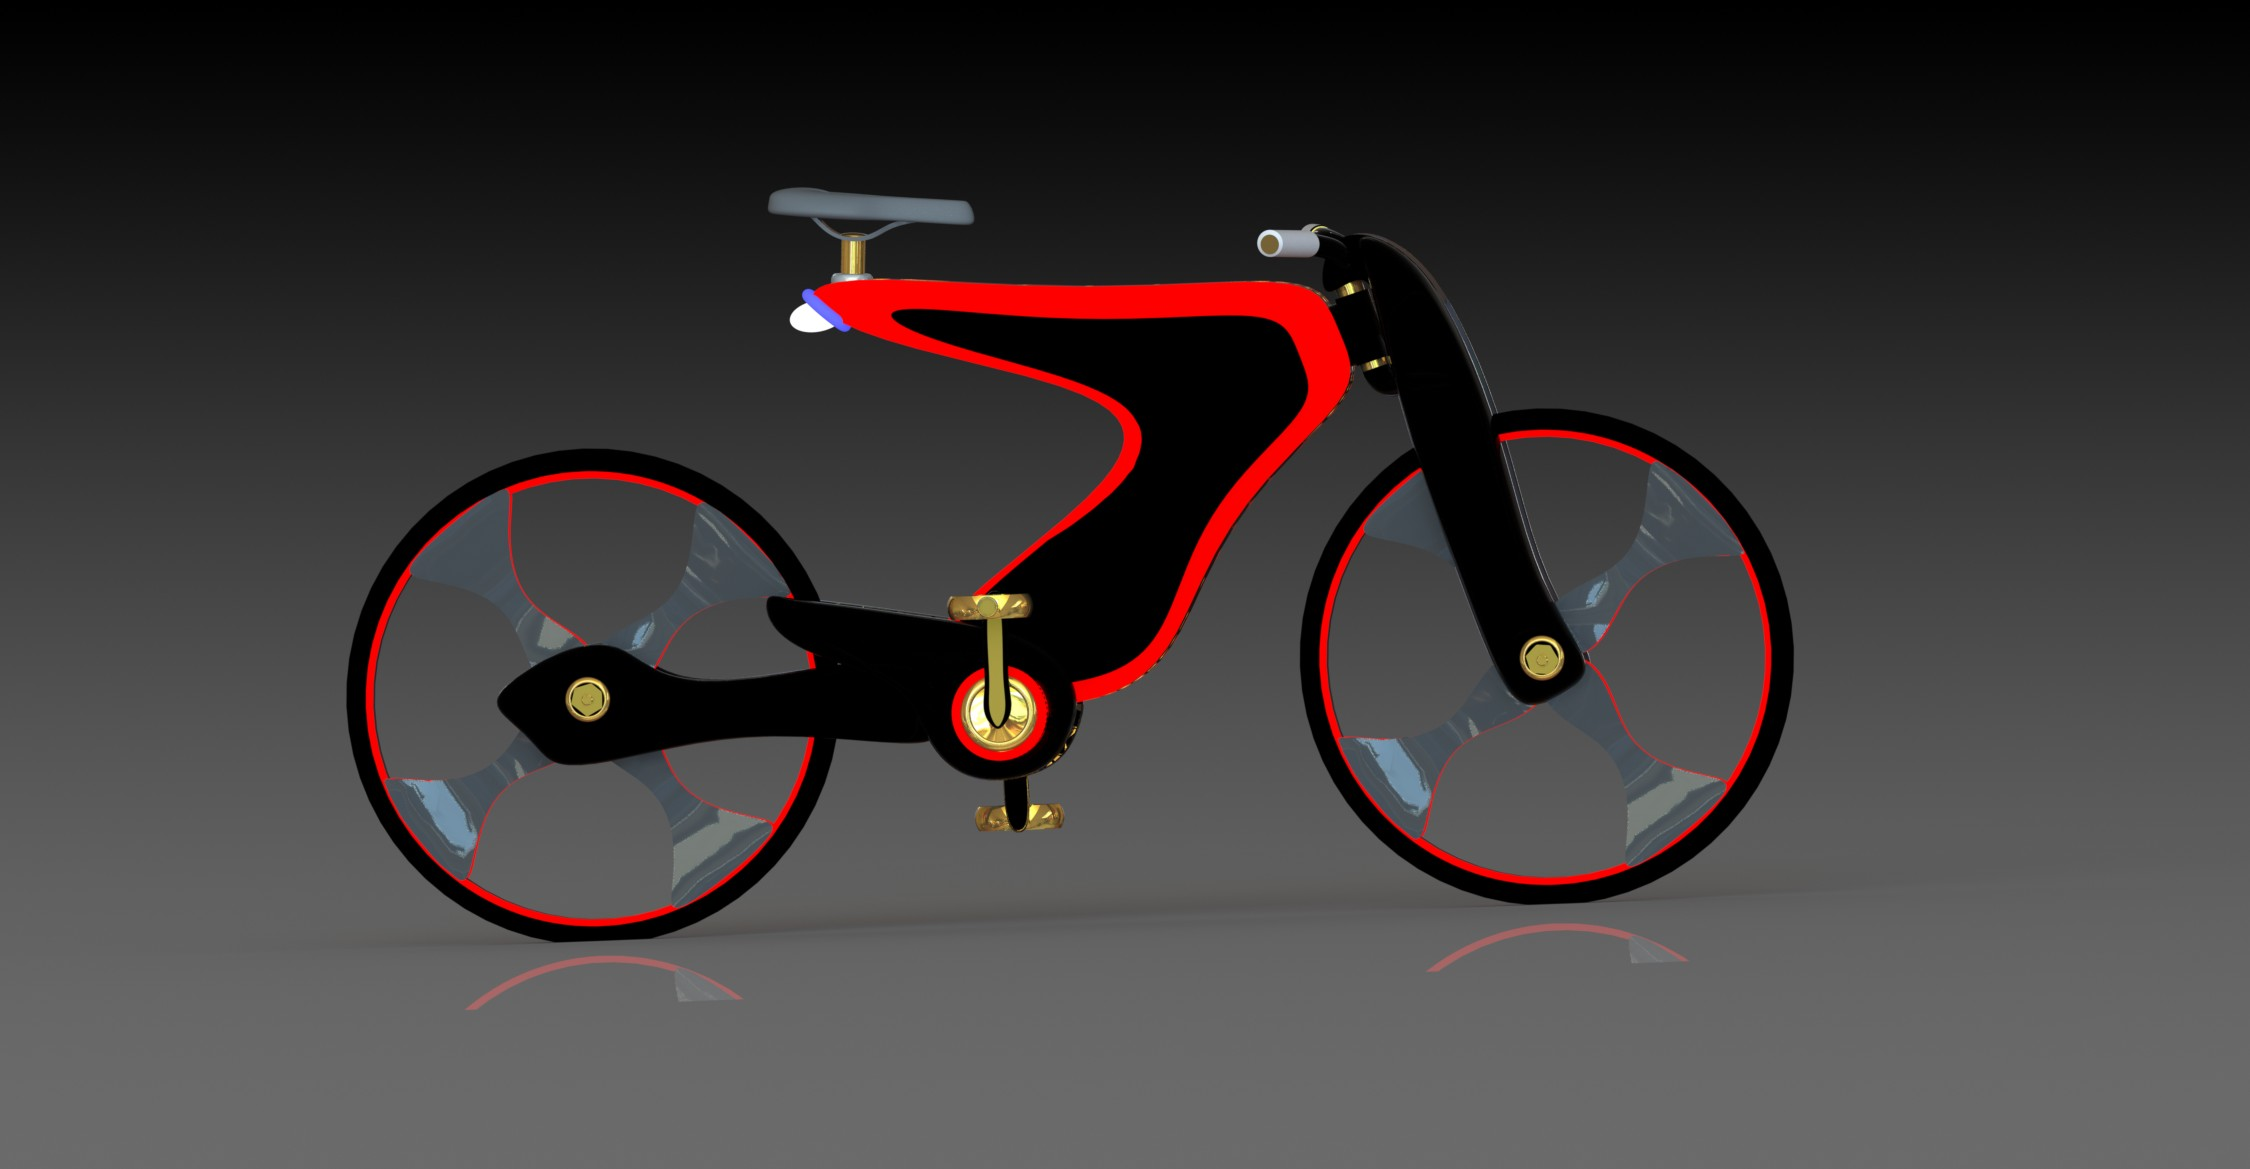 bike design by bereket abraham at Coroflot.com